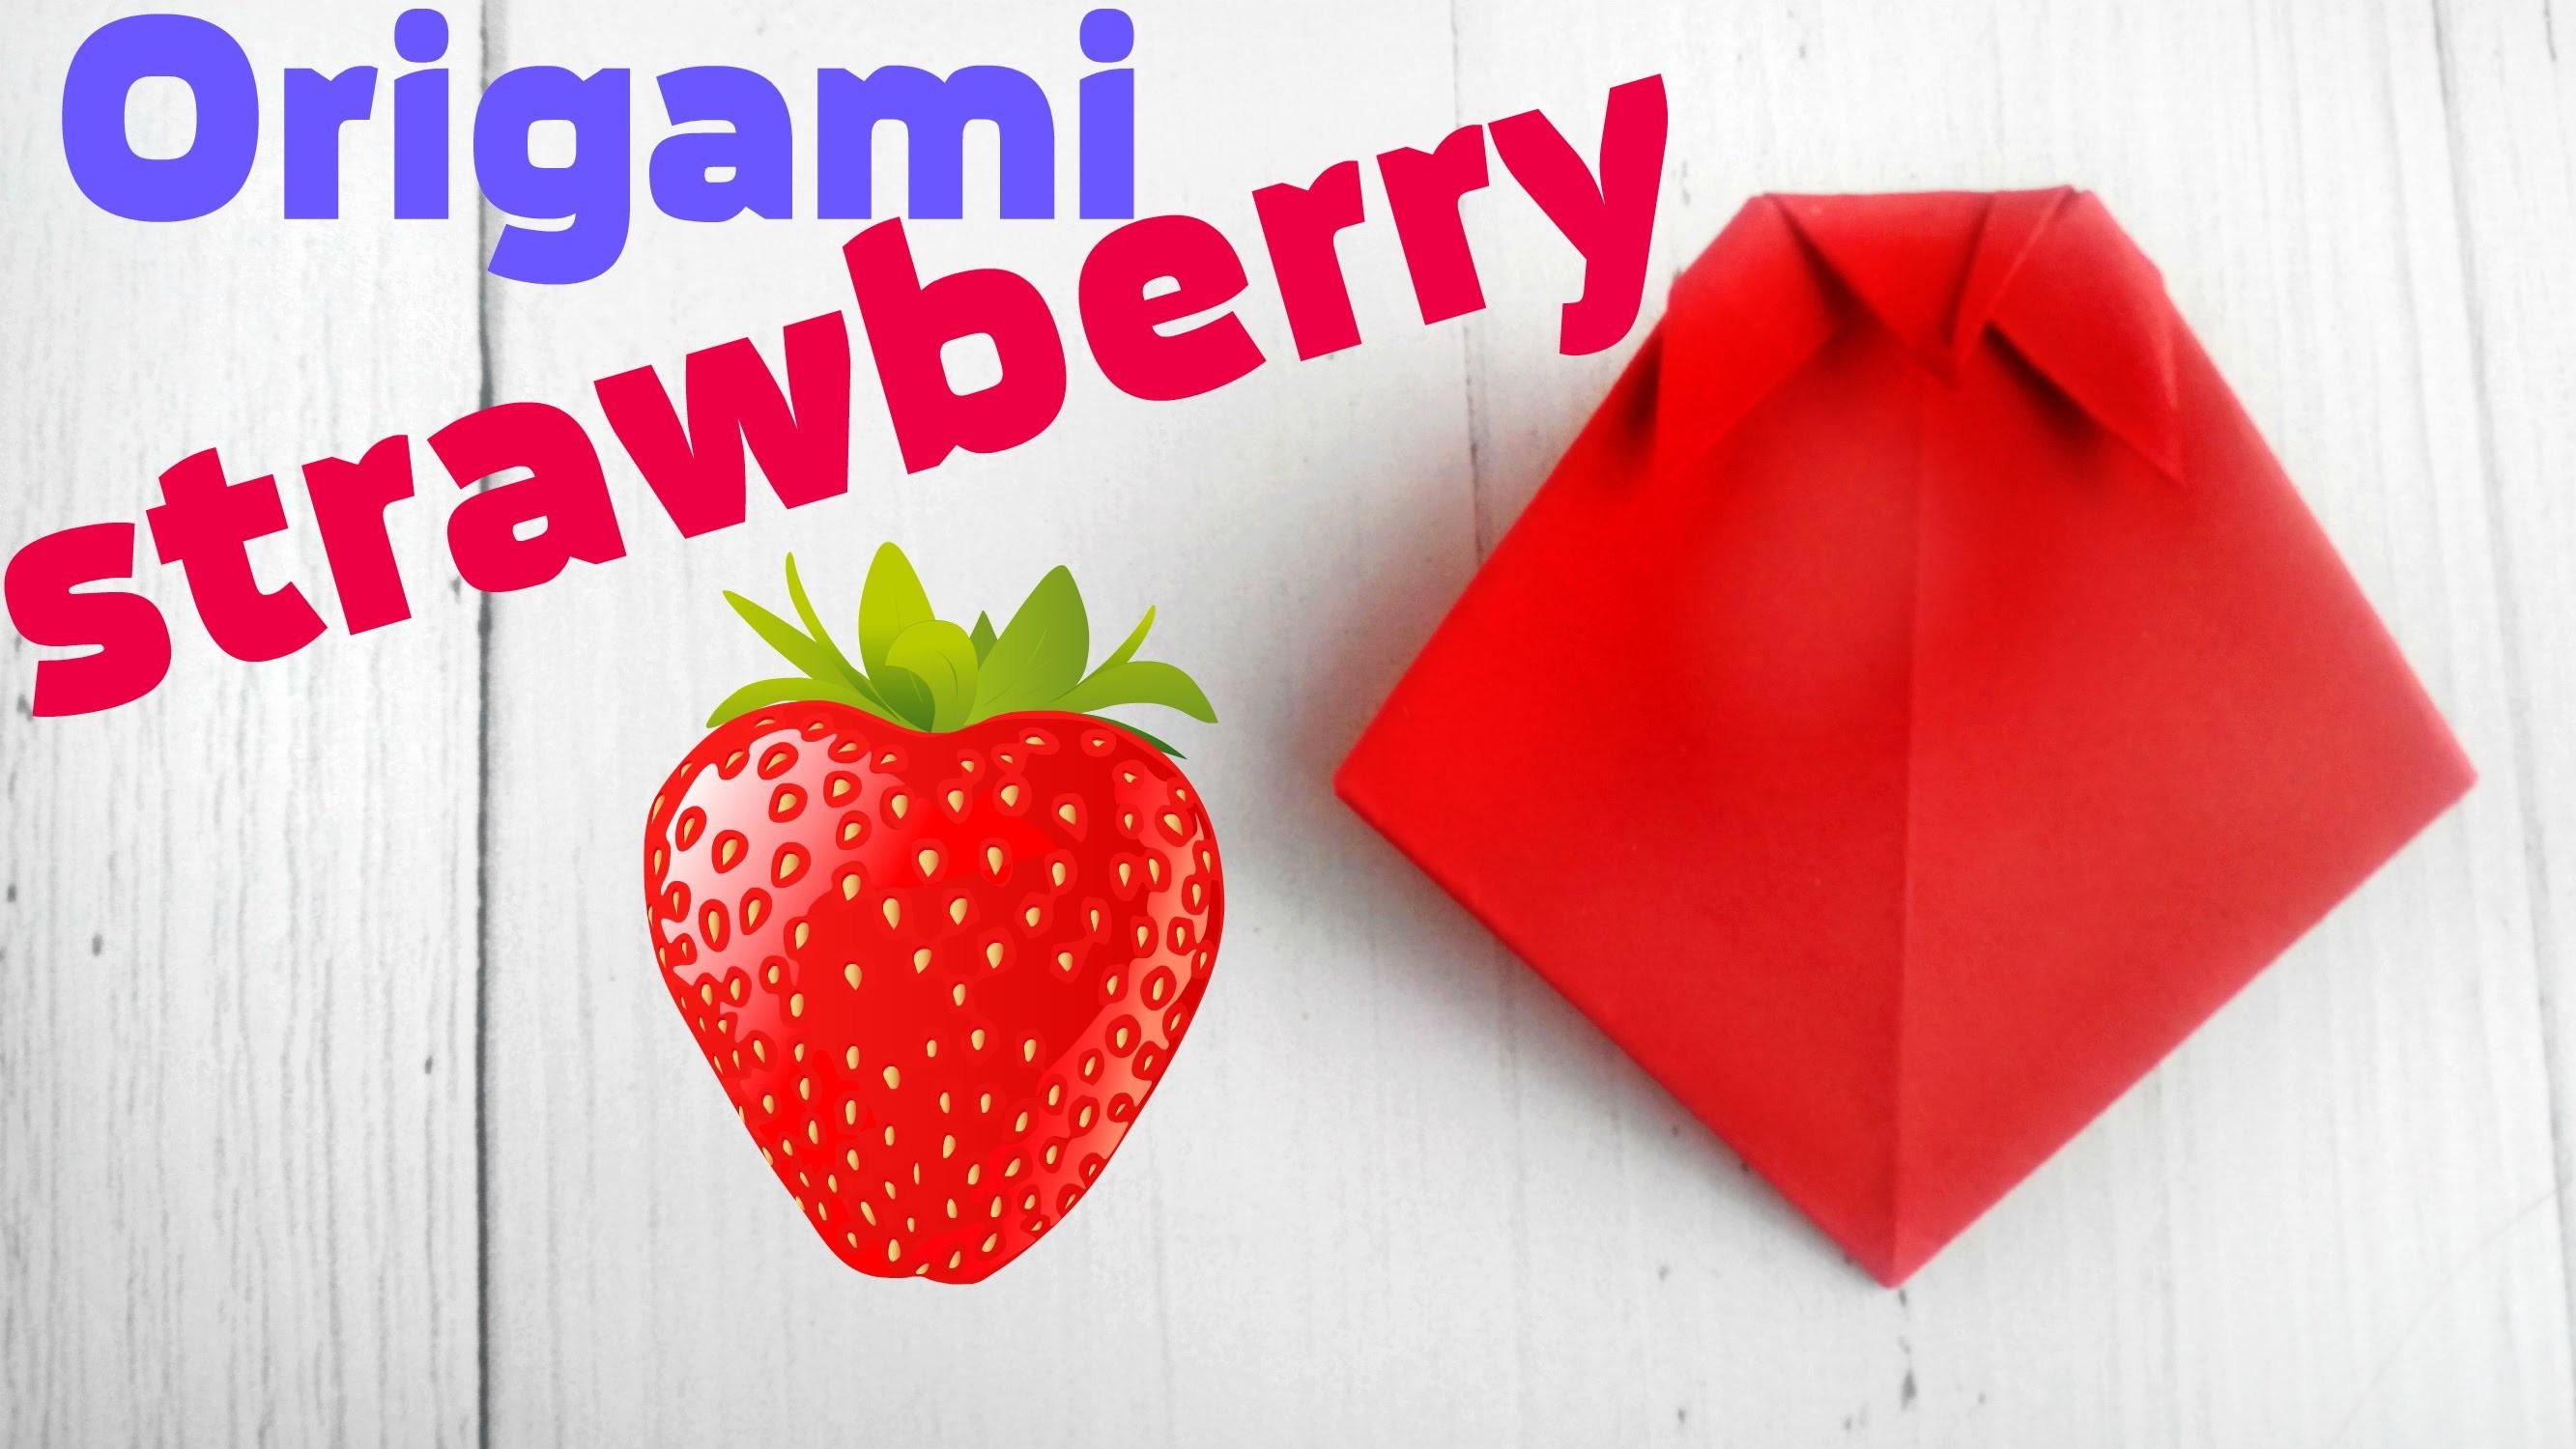 strawberry fruit diagram car spotlight wiring origami tutorial easy instructions 3d scheme